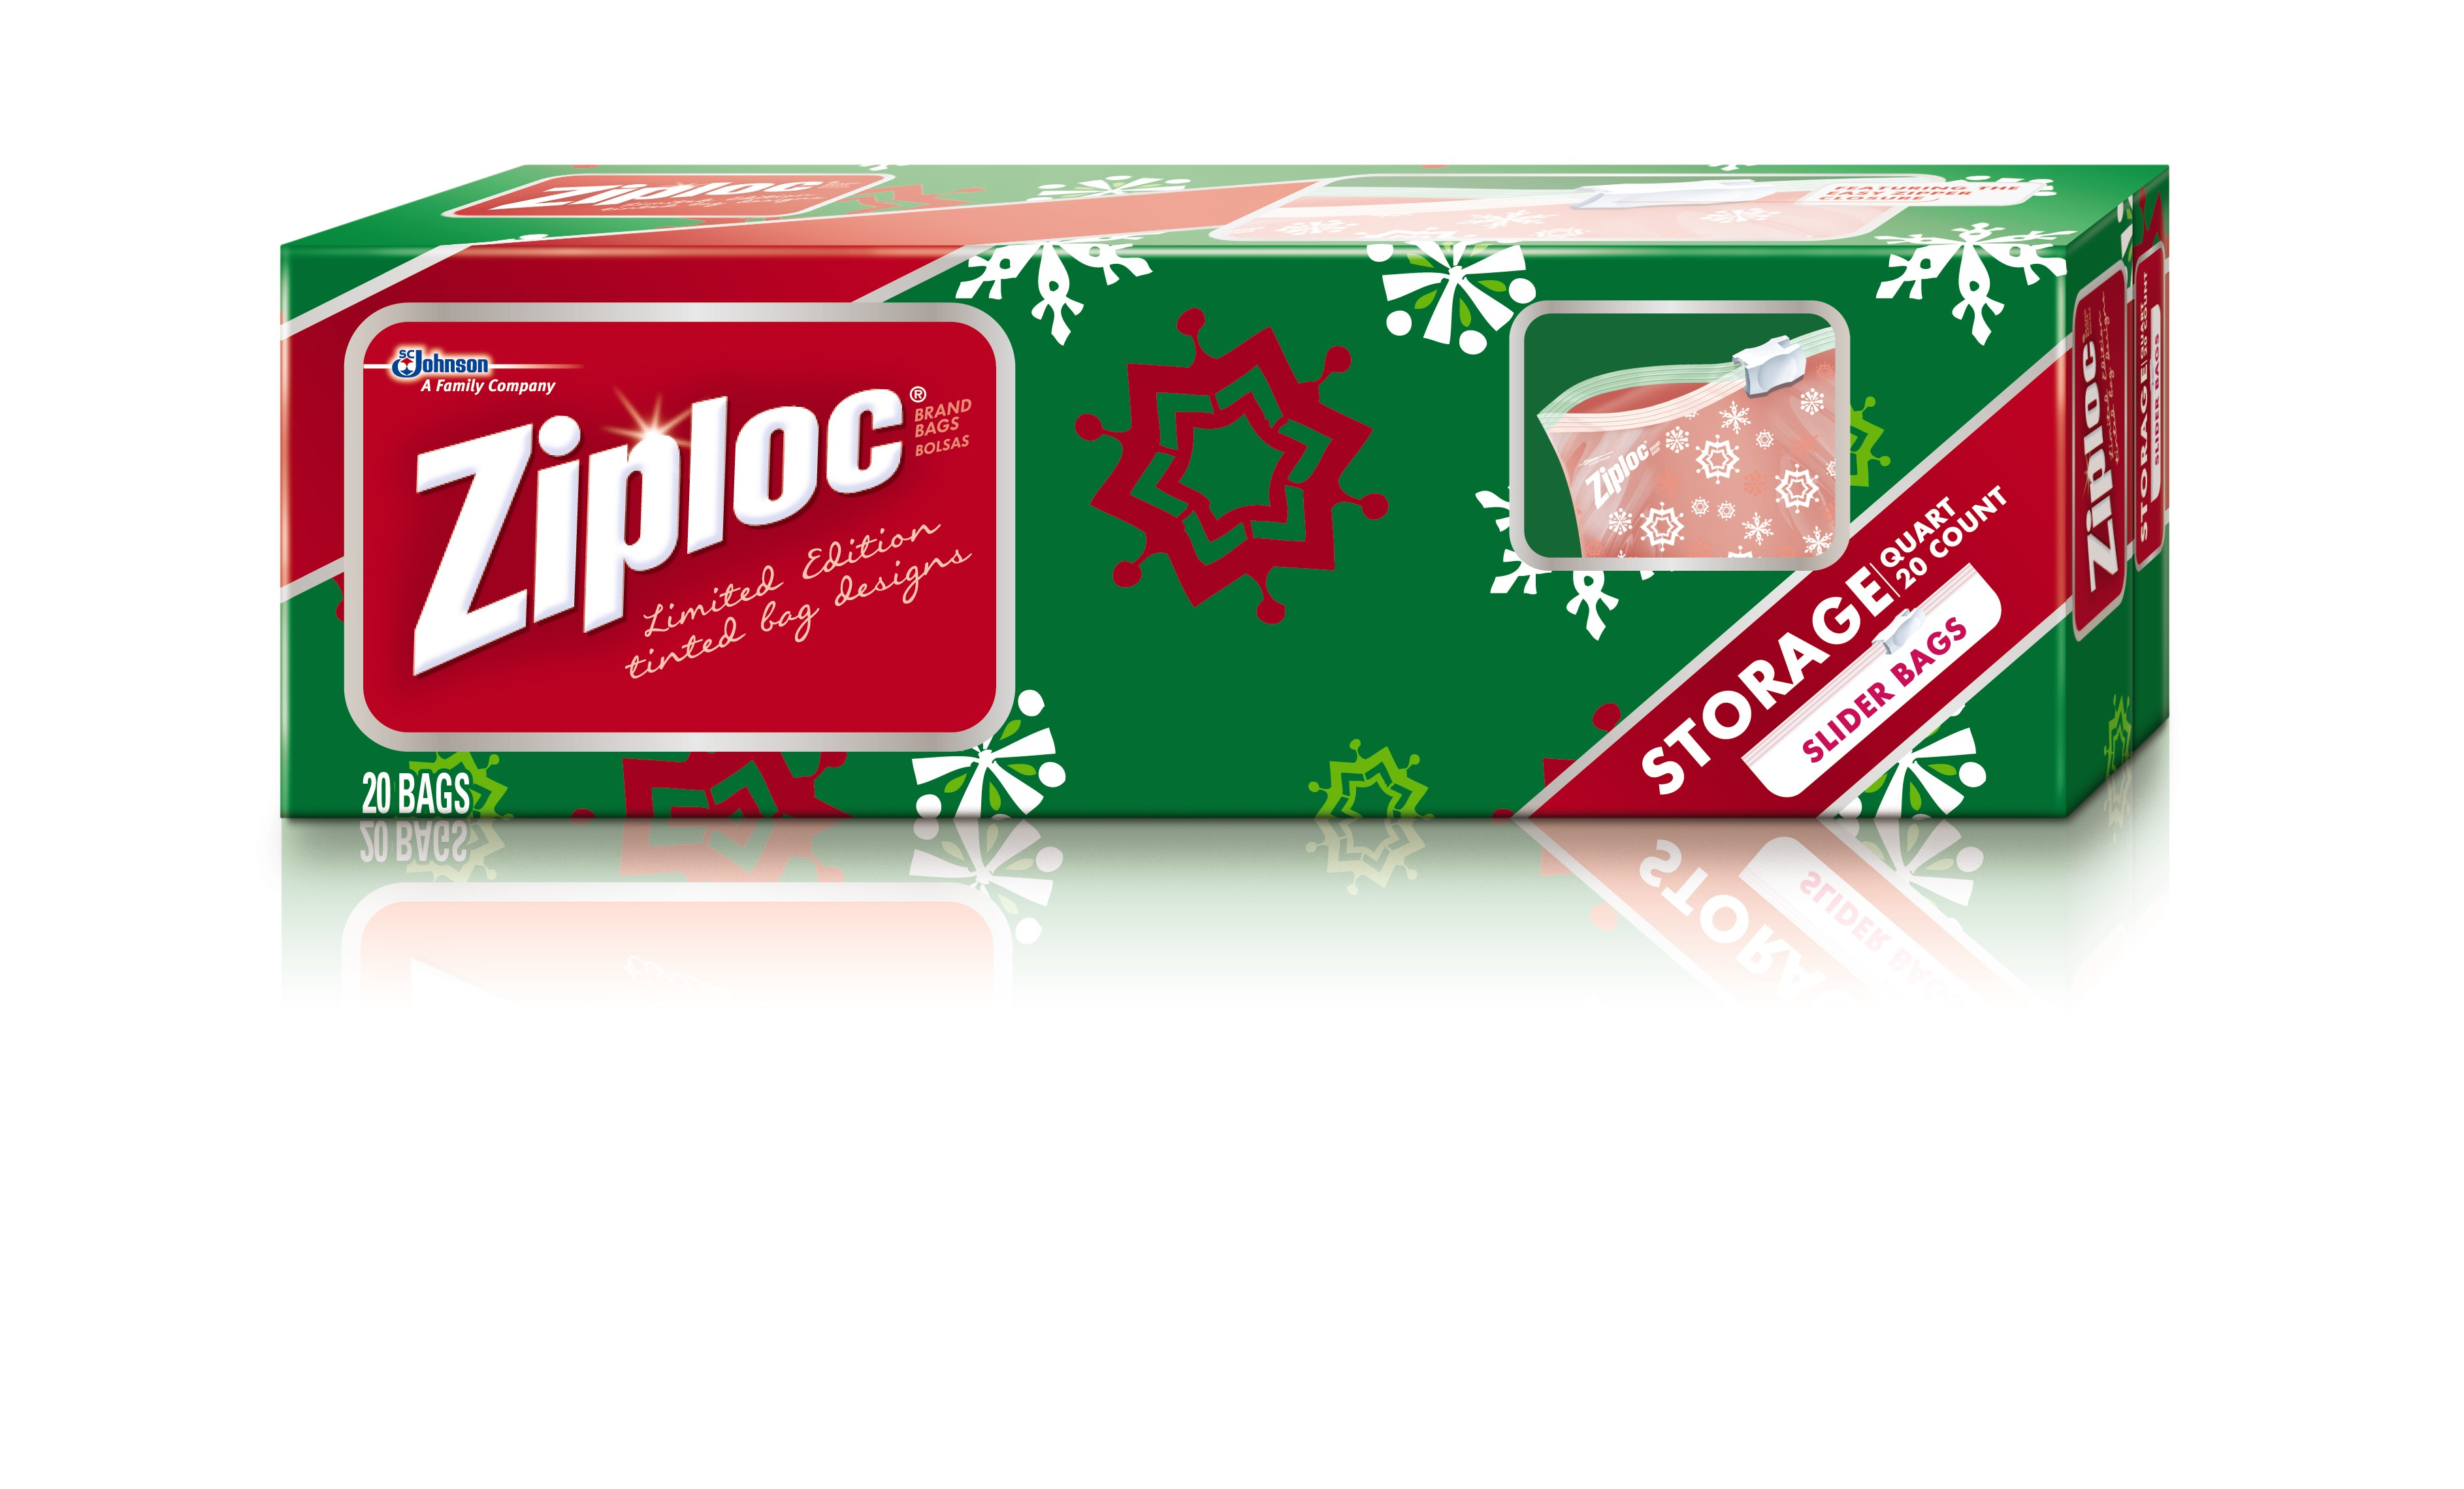 cheer and wonderful memories with ziplock and